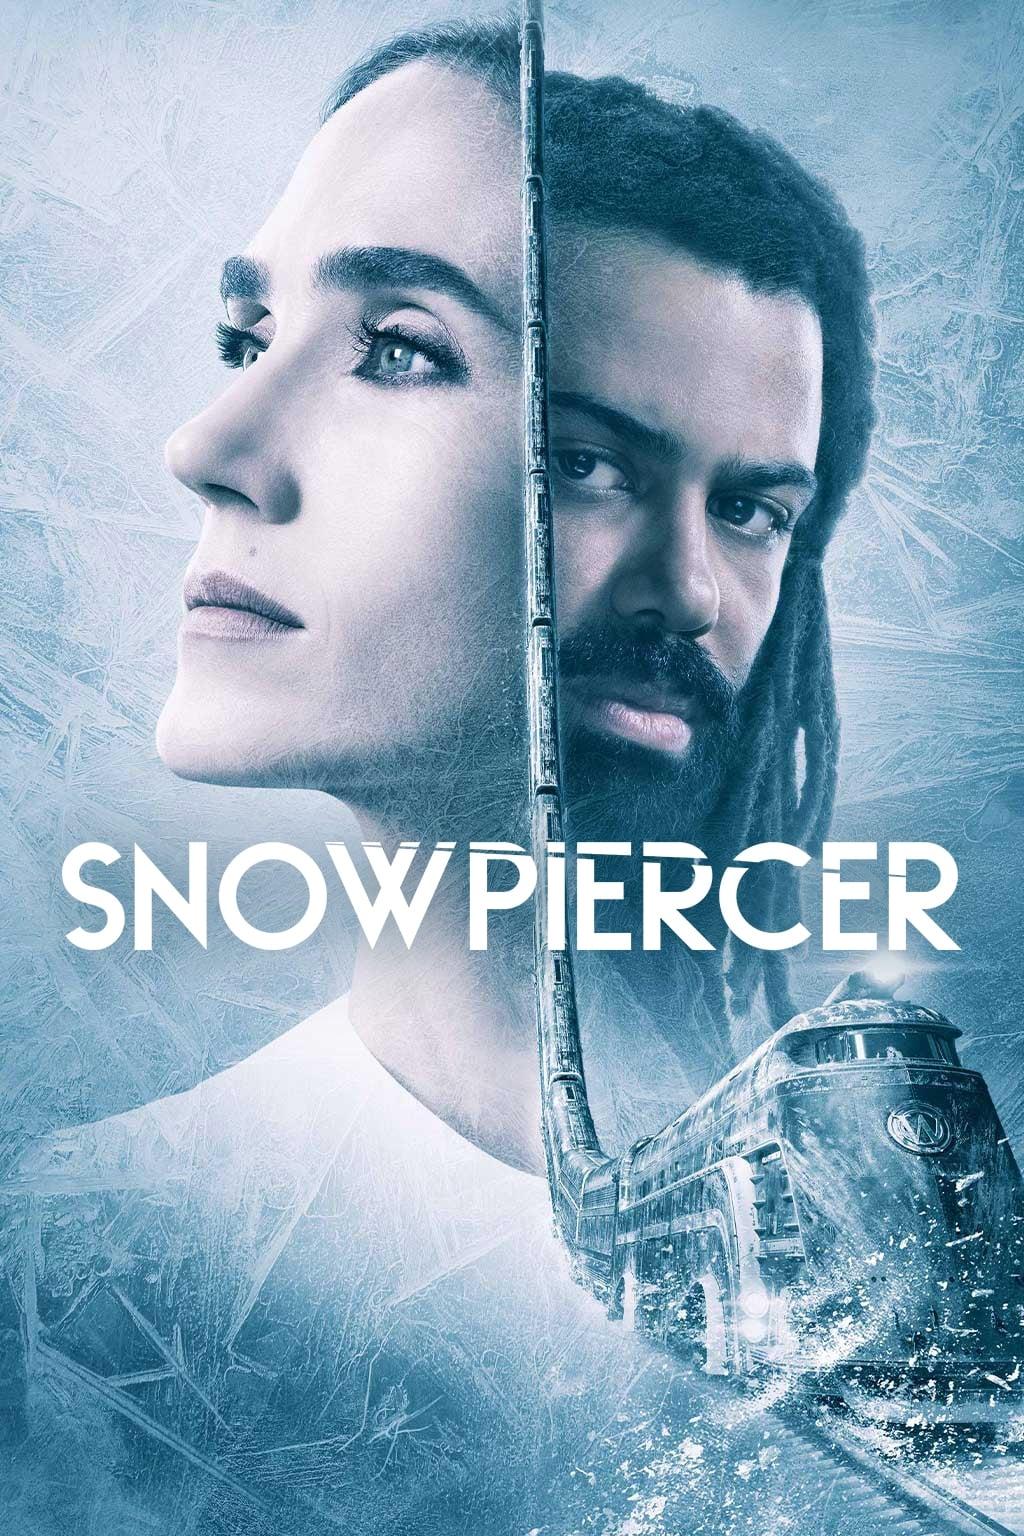 Snowpiercer Season 1